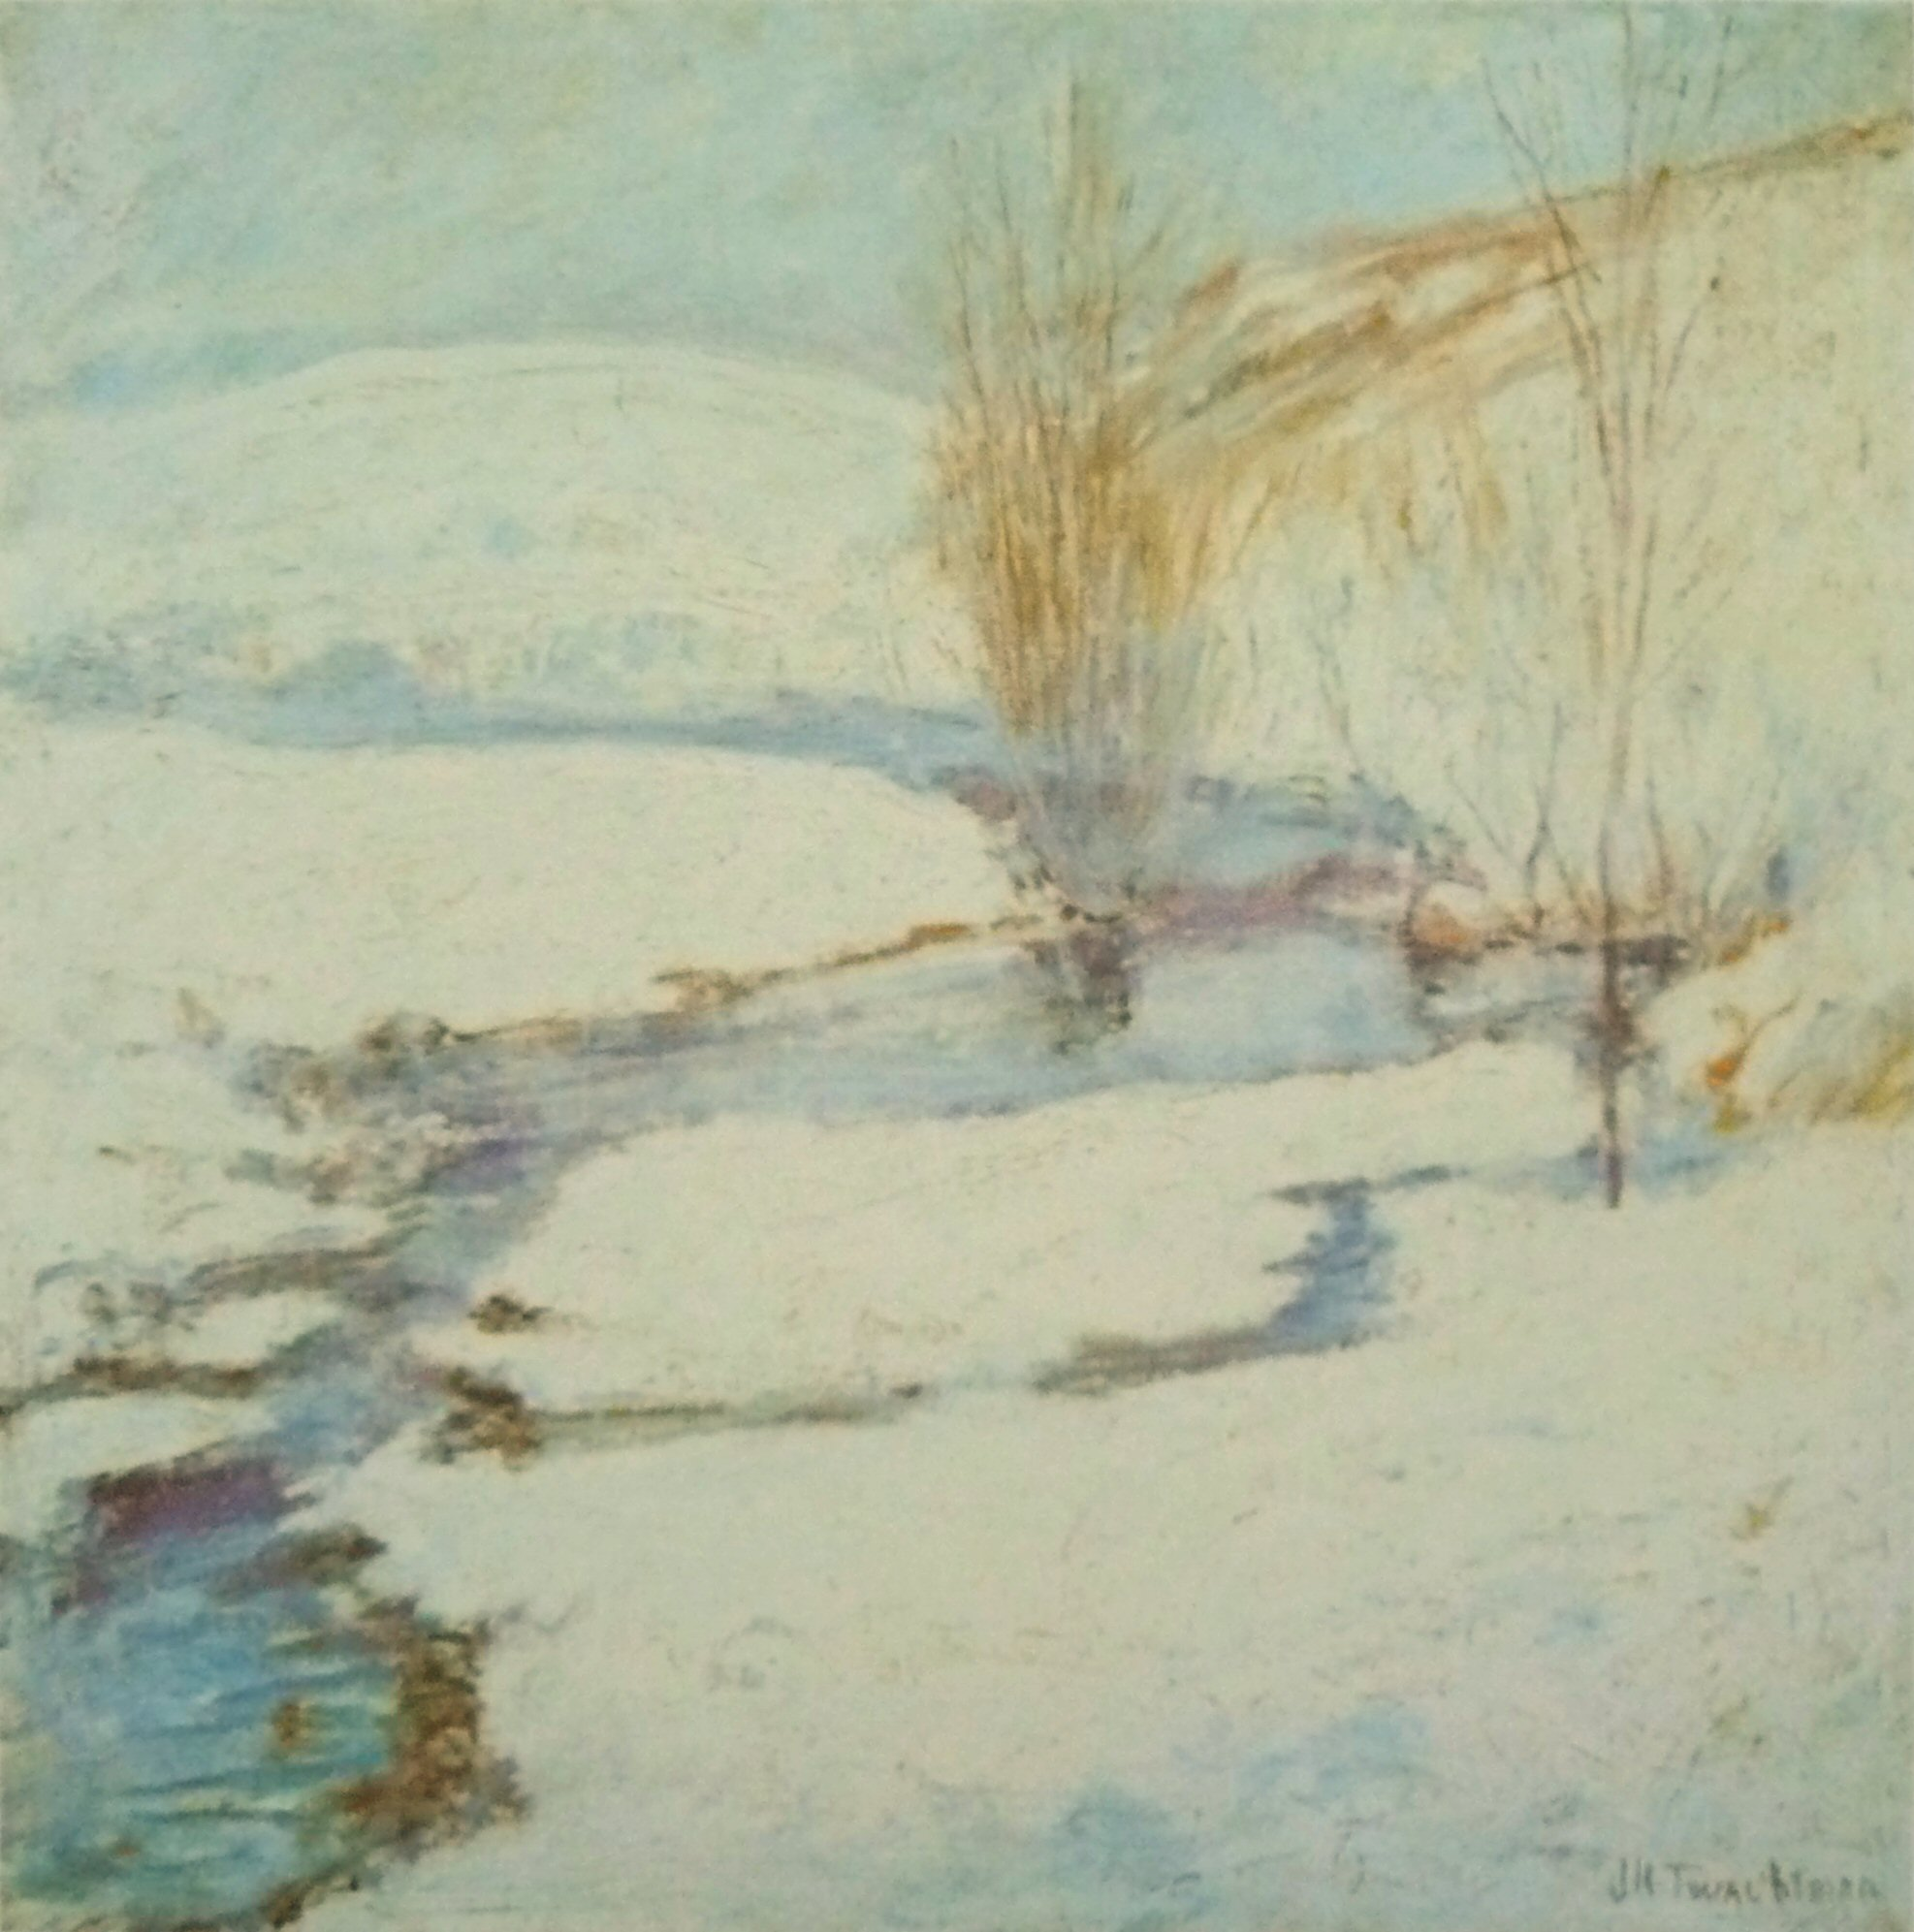 Winter Landscape, 1890-1900